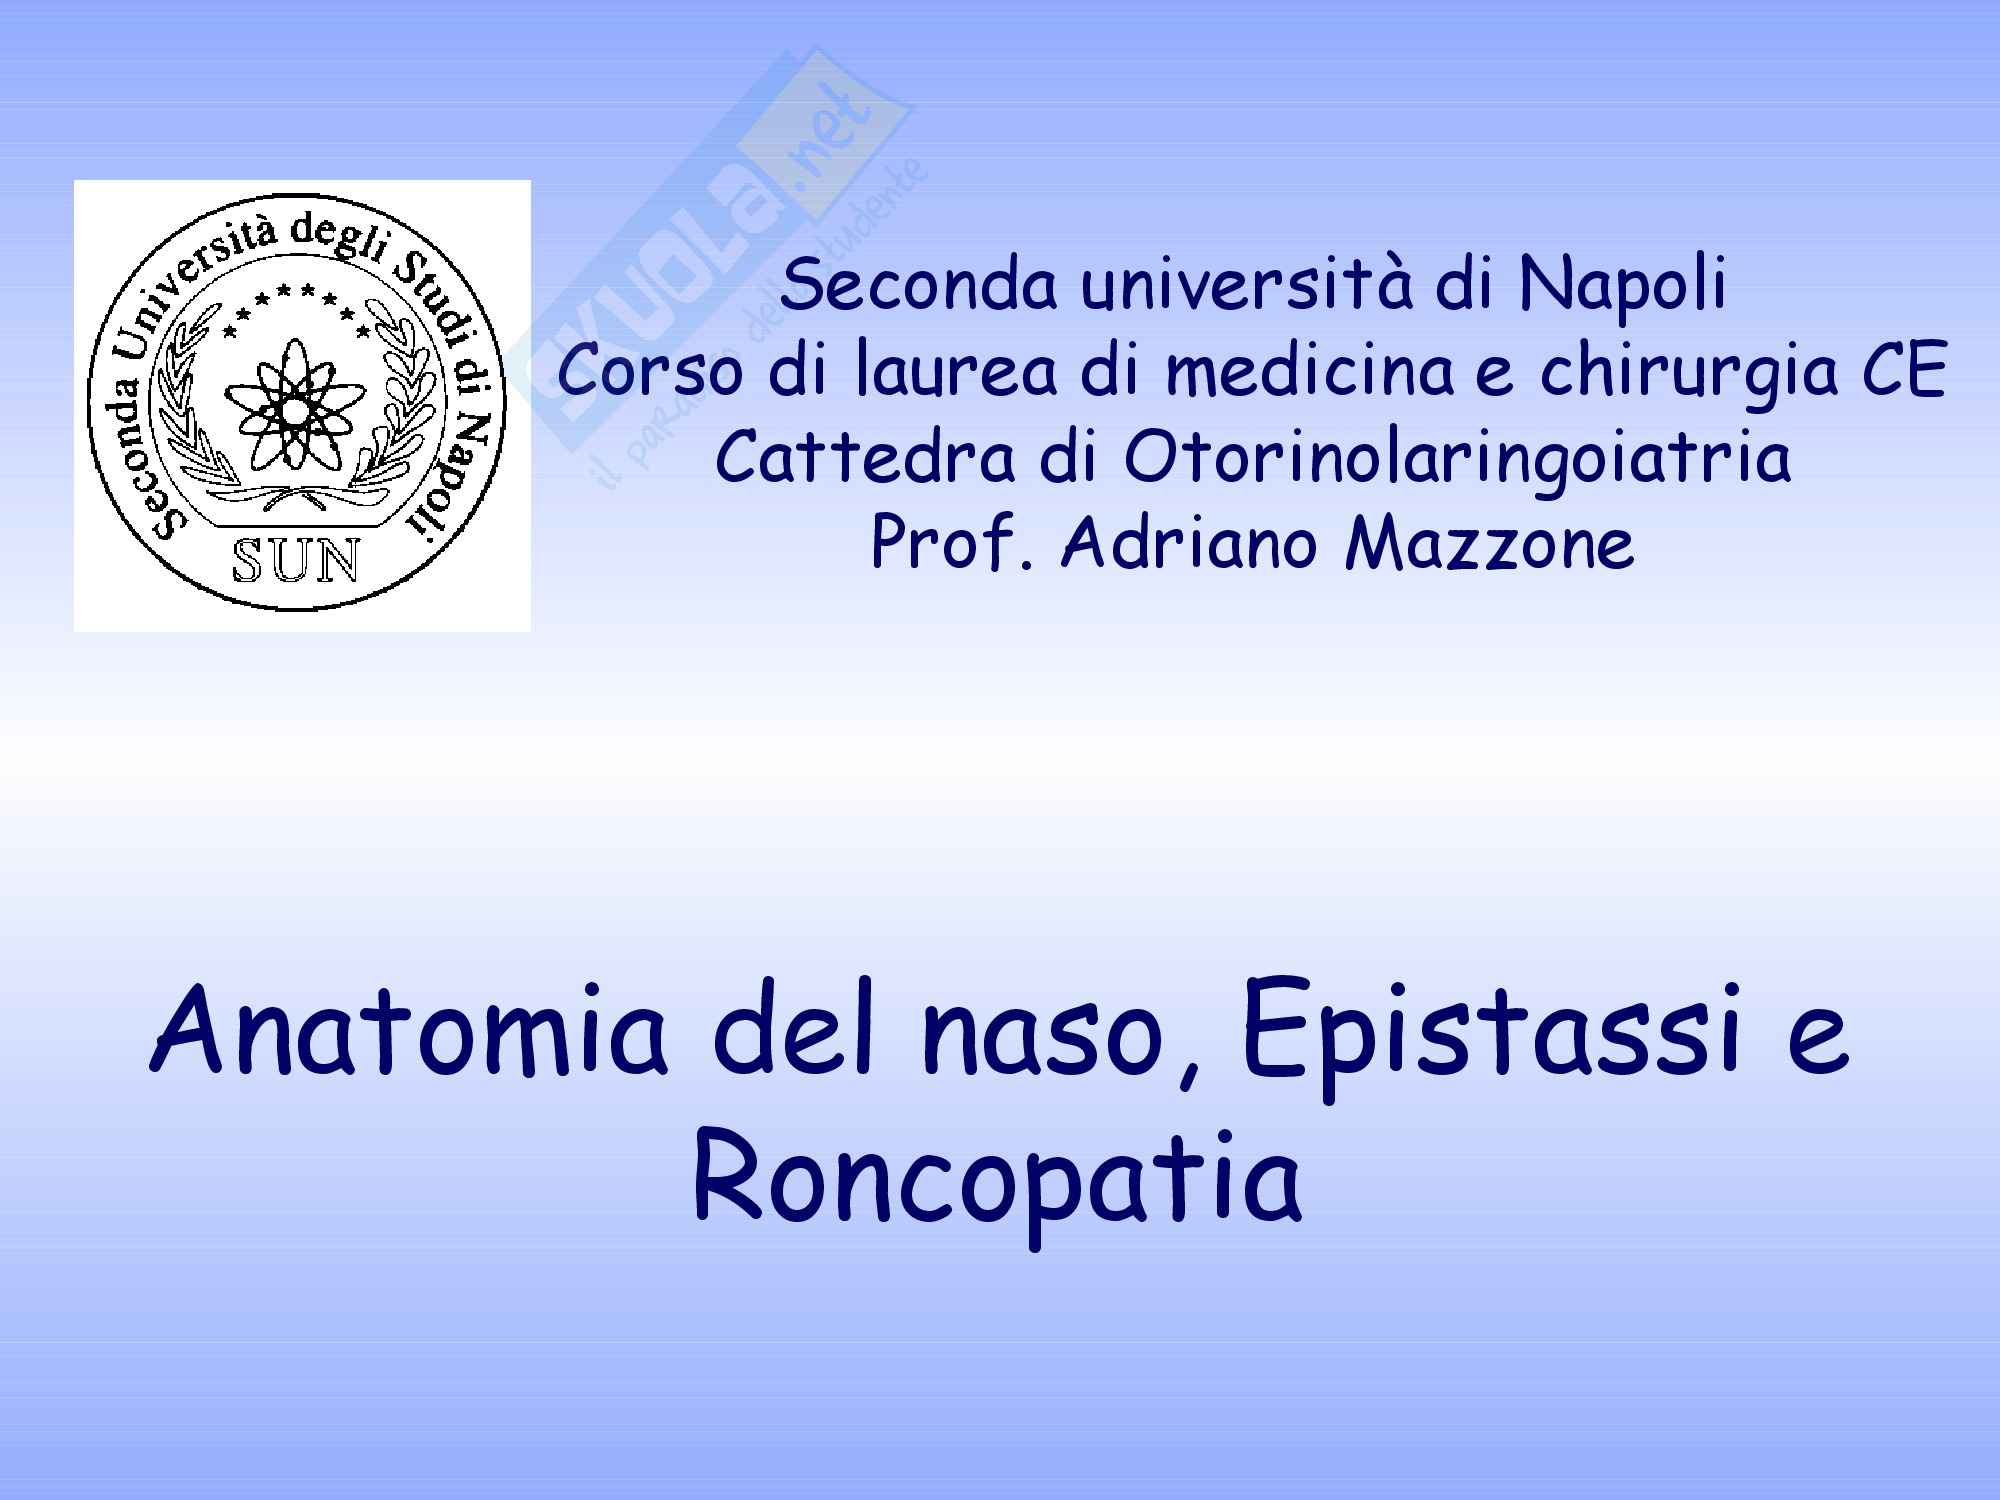 Otorinolaringoiatria - epistassi e roncopatia